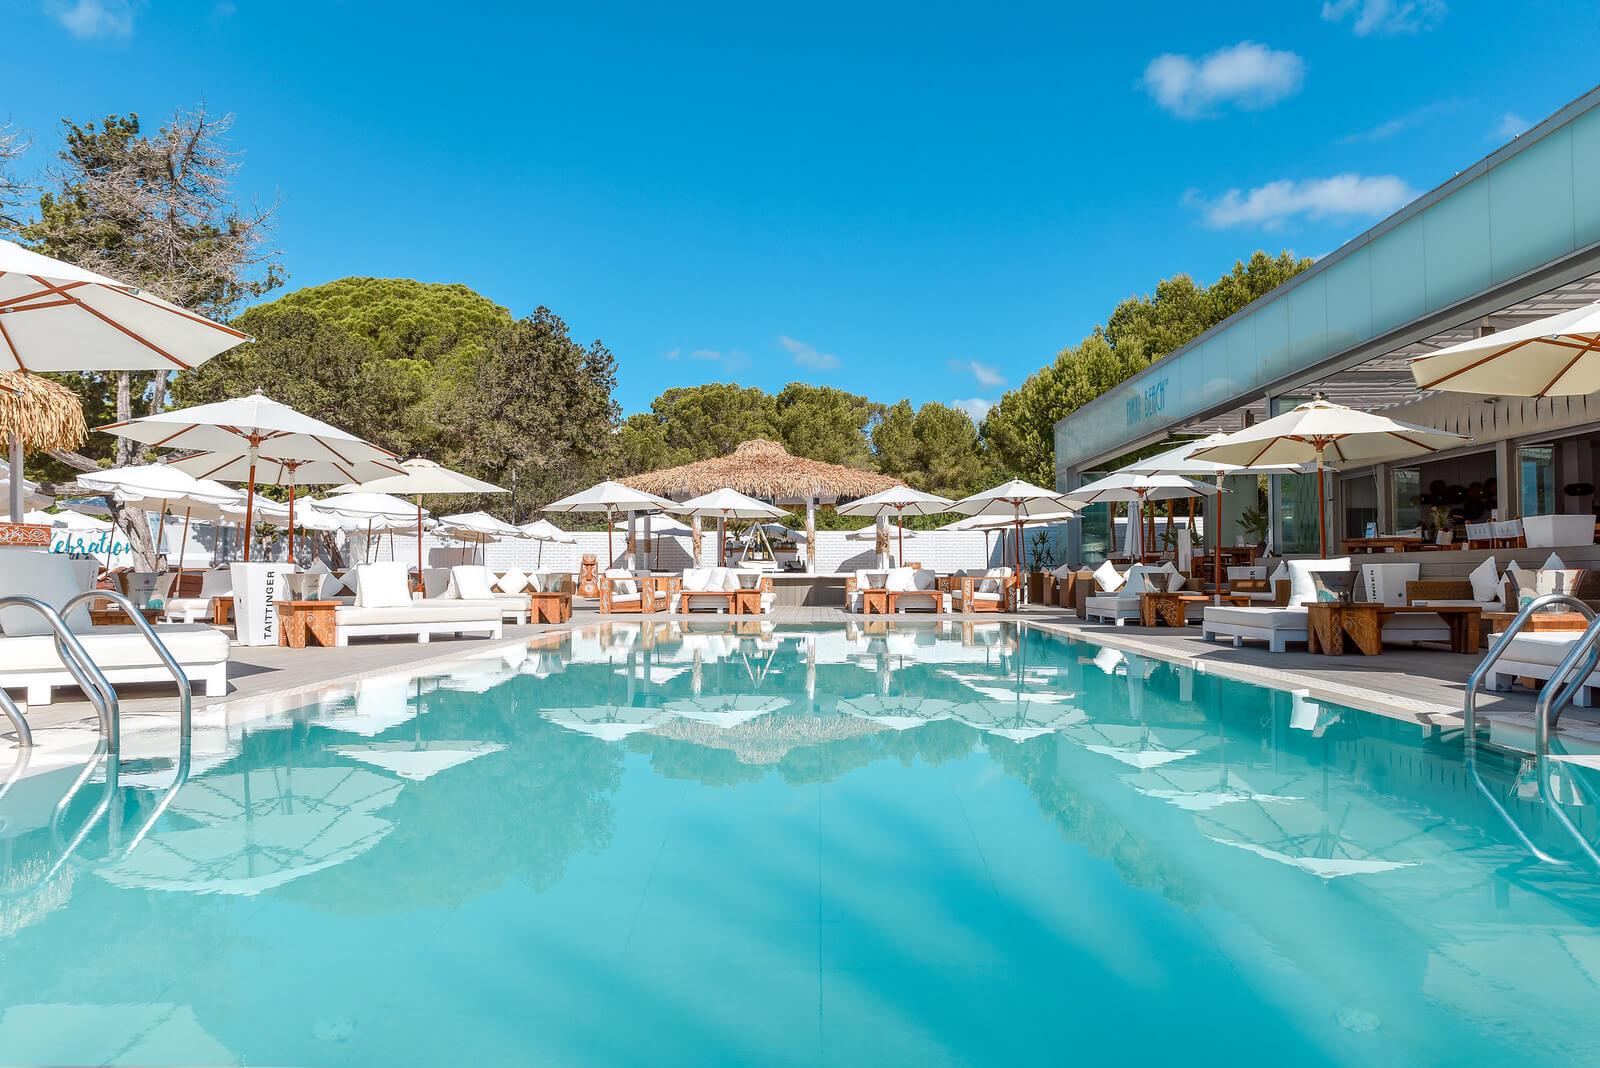 https://www.white-ibiza.com/wp-content/uploads/2020/03/white-ibiza-restaurants-nikki-beach-ibiza-2020-10.jpg